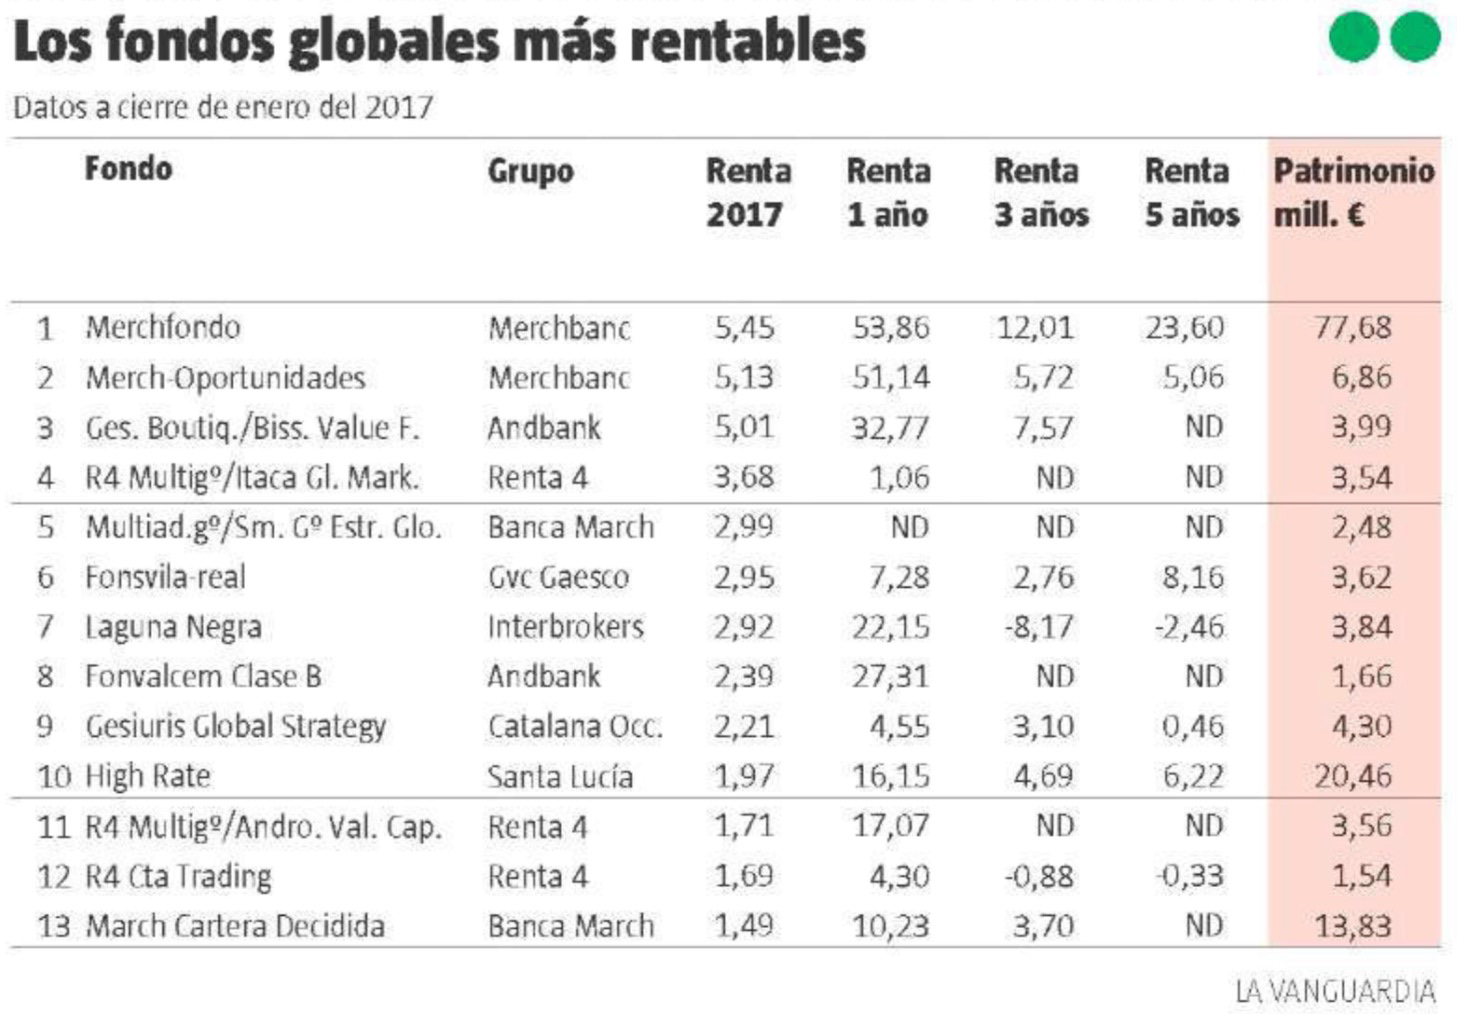 La Vanguardia, los fondos globales 12-02-2017 cuadro